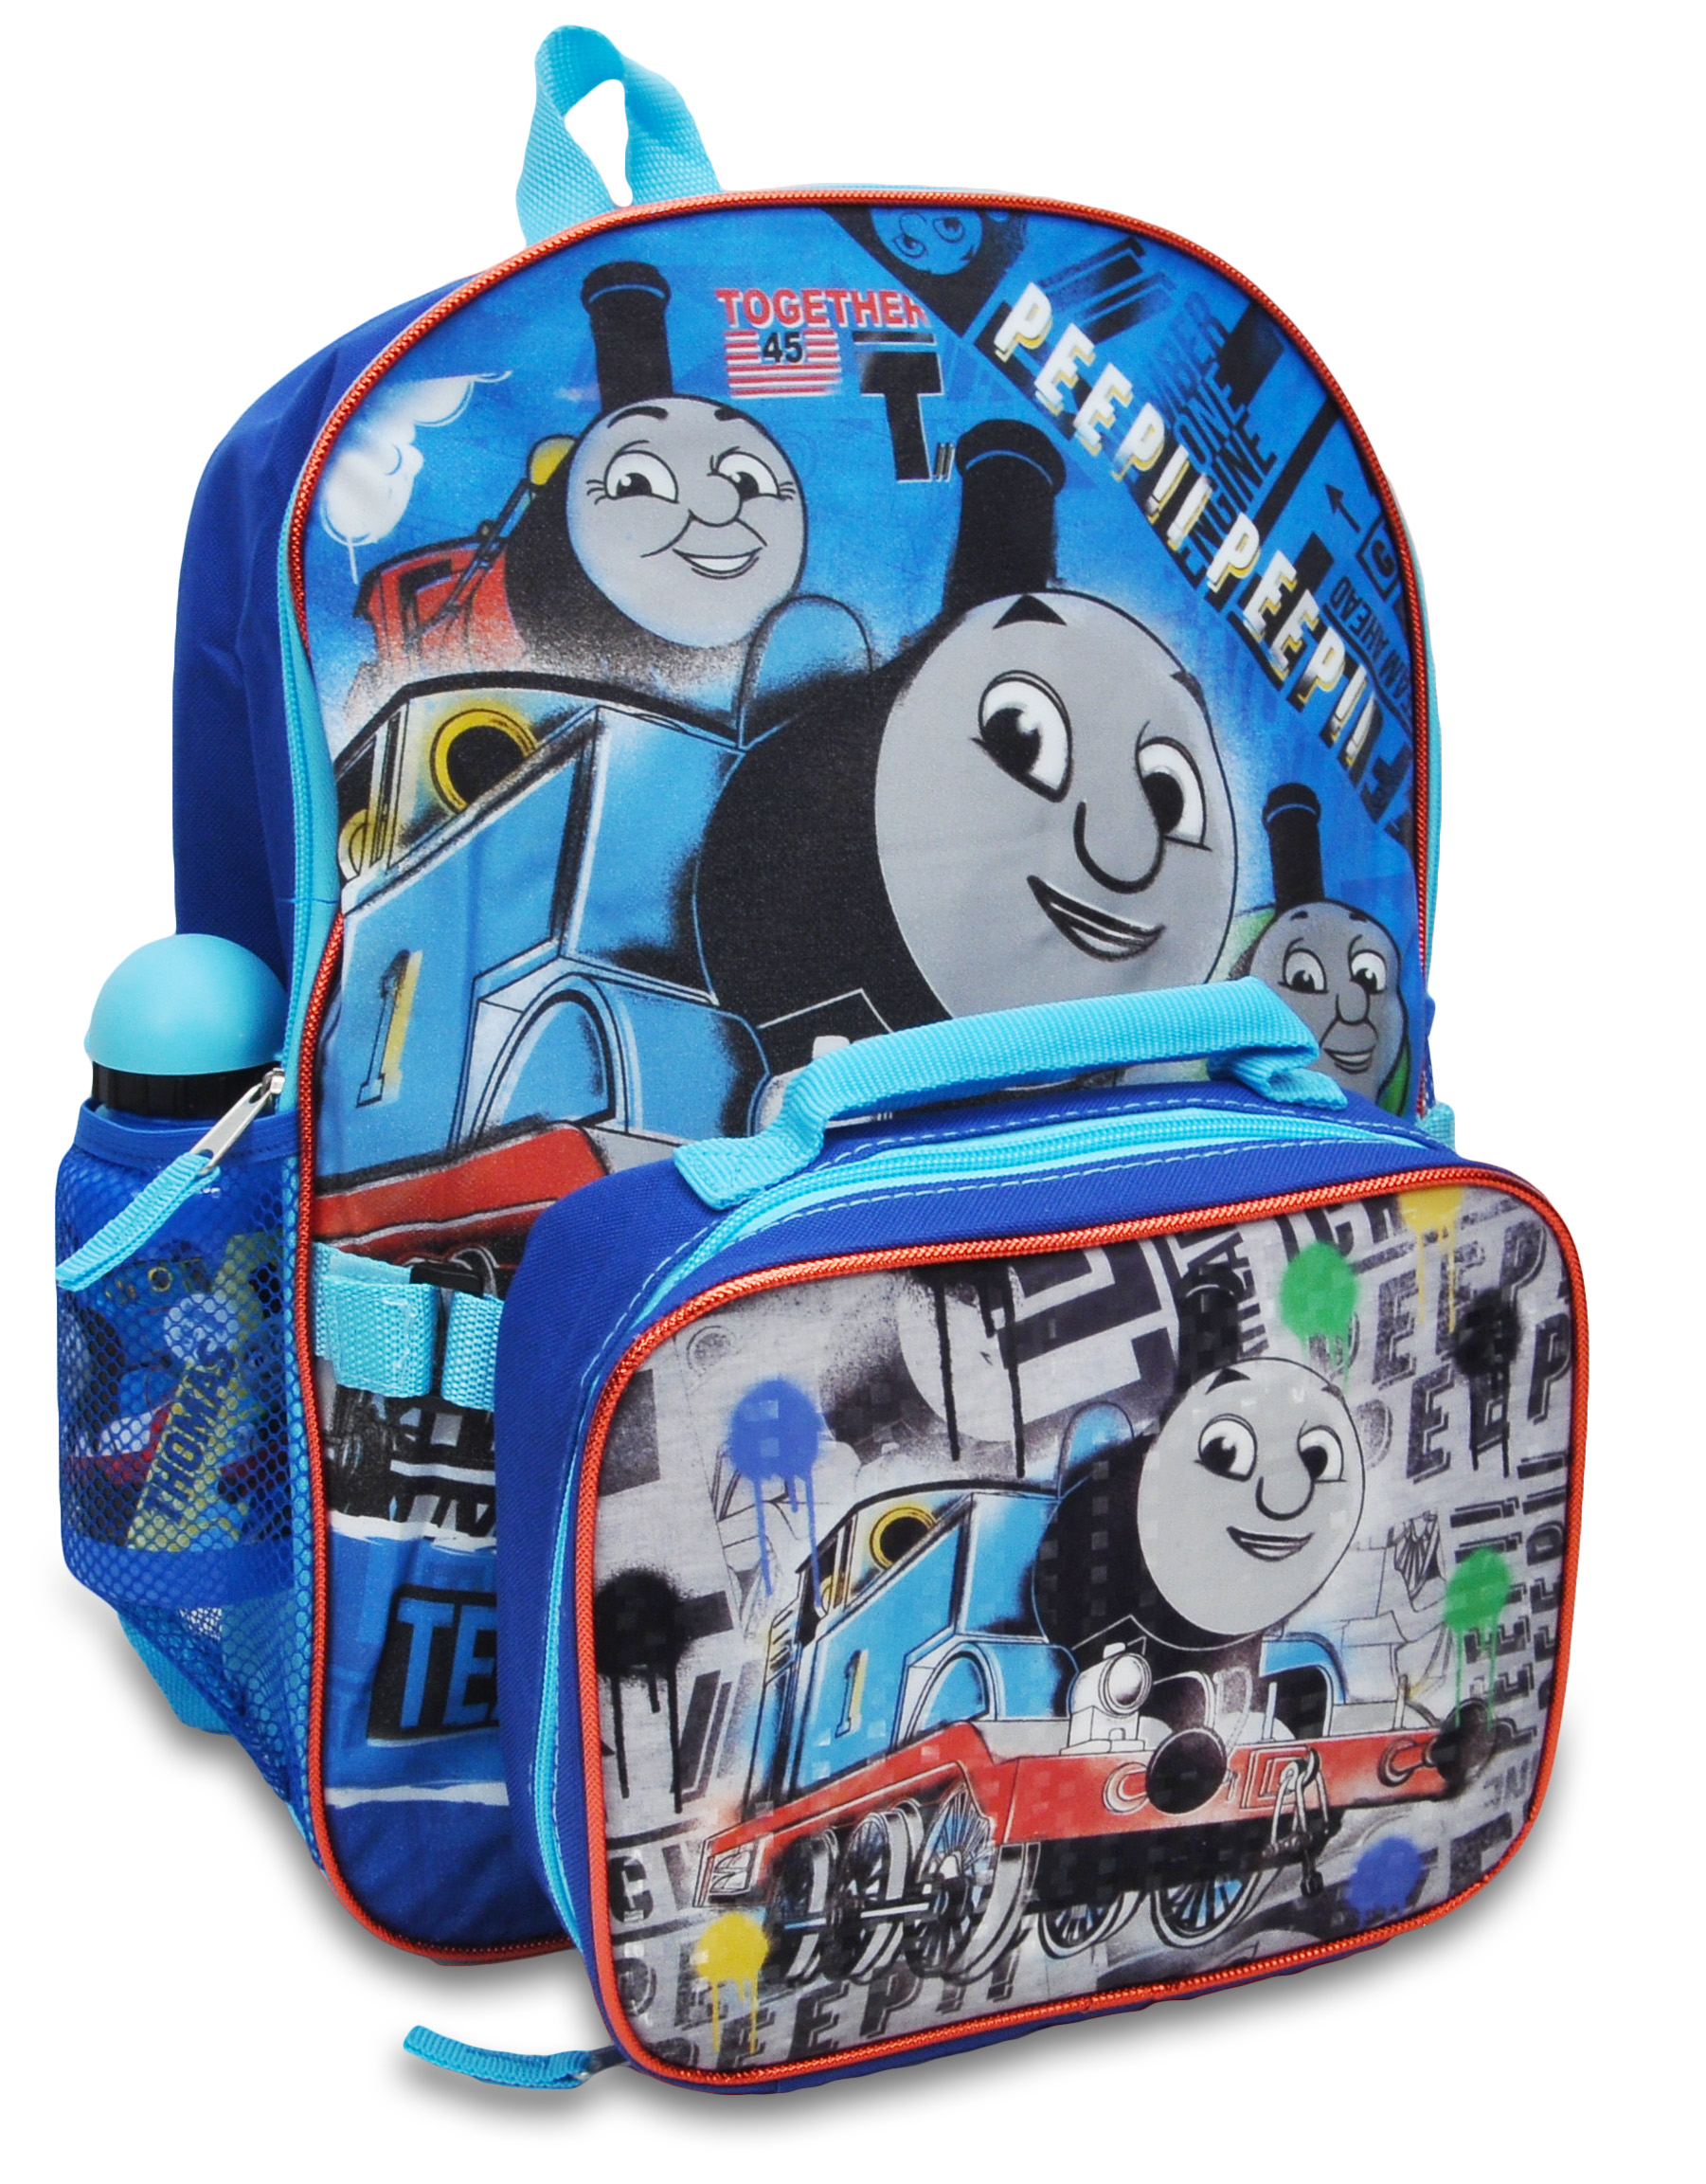 Thomas The Tank Engine Backpack Bag School Nursery Picnic Travel Holidays Light